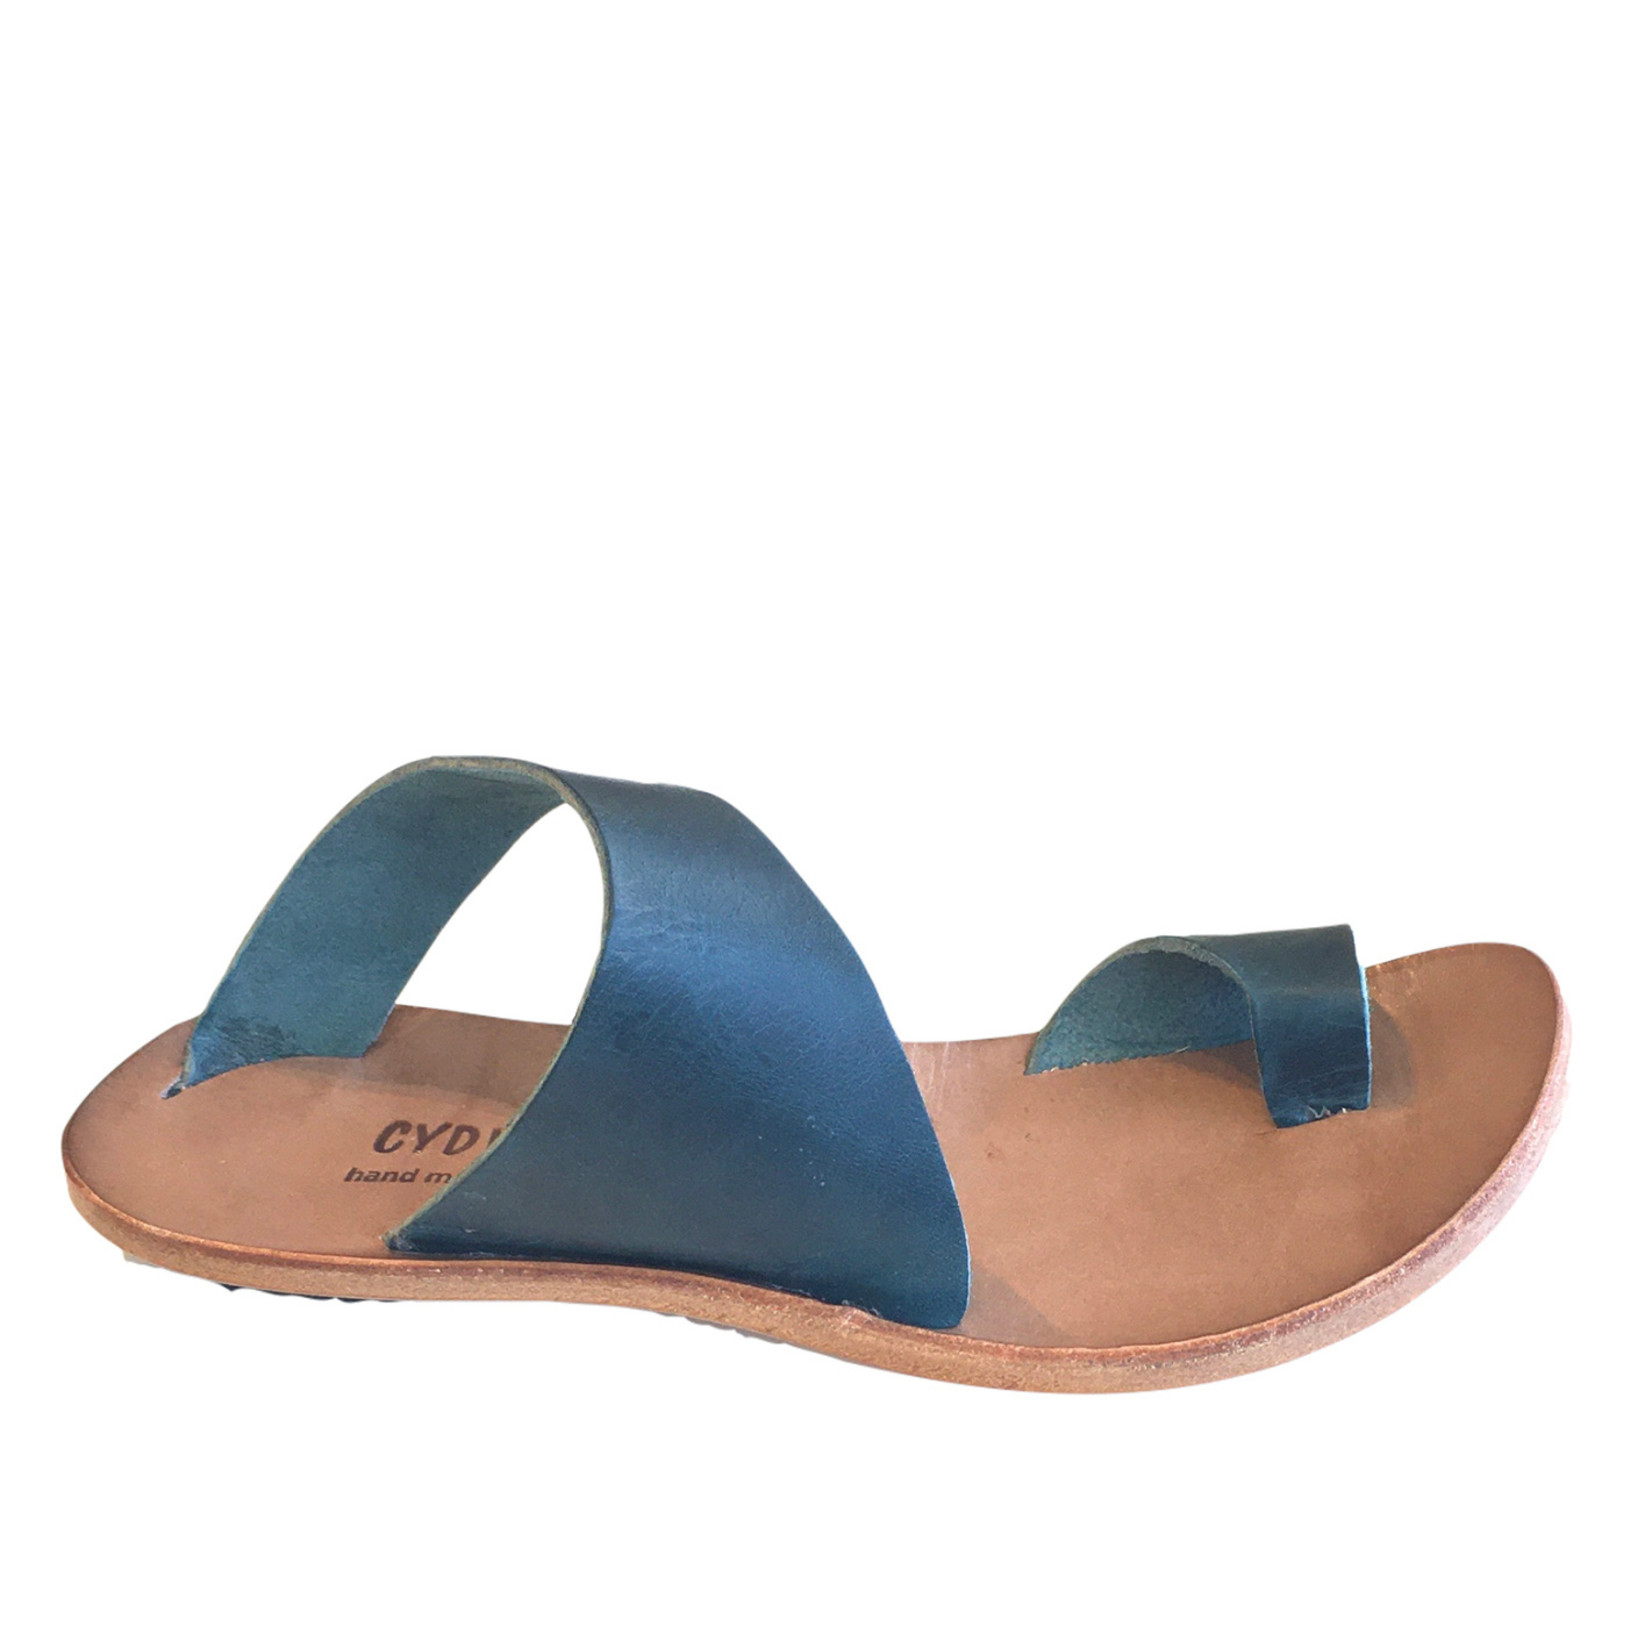 Cydwoq Thong Turquoise